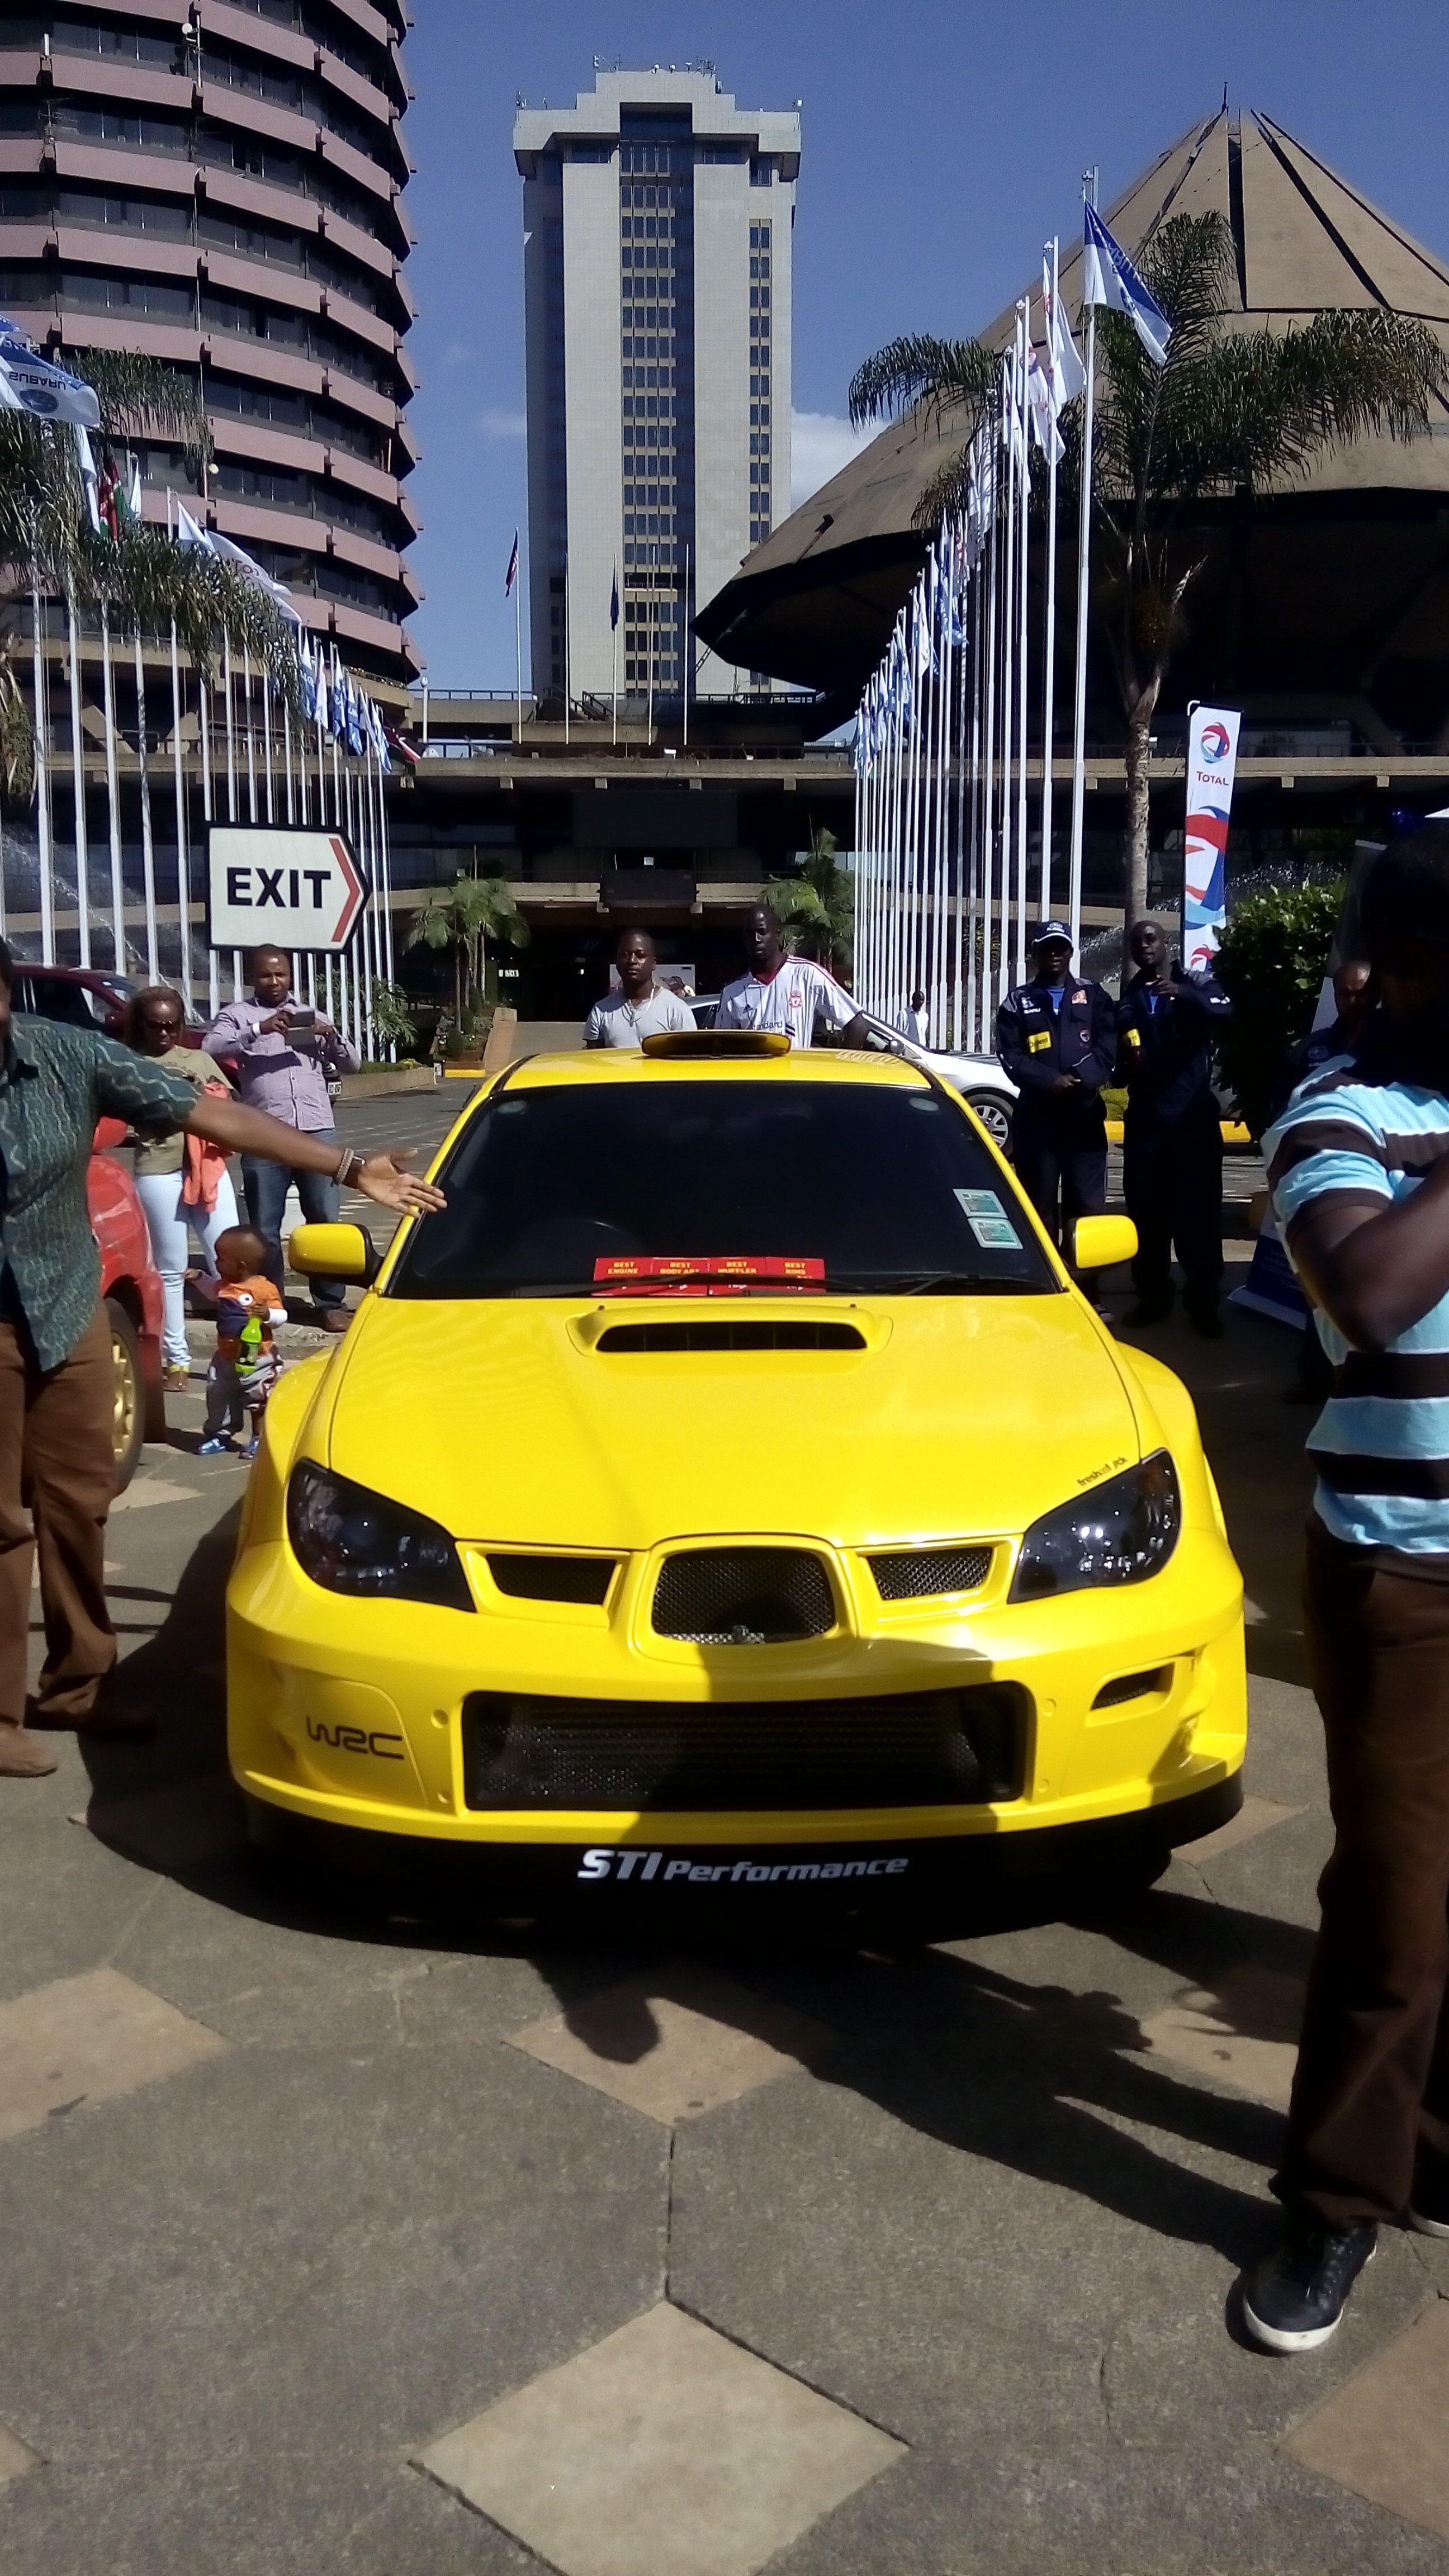 Subaru Confidence In Motion Motor Fest Kicc Nairobi Kenya With